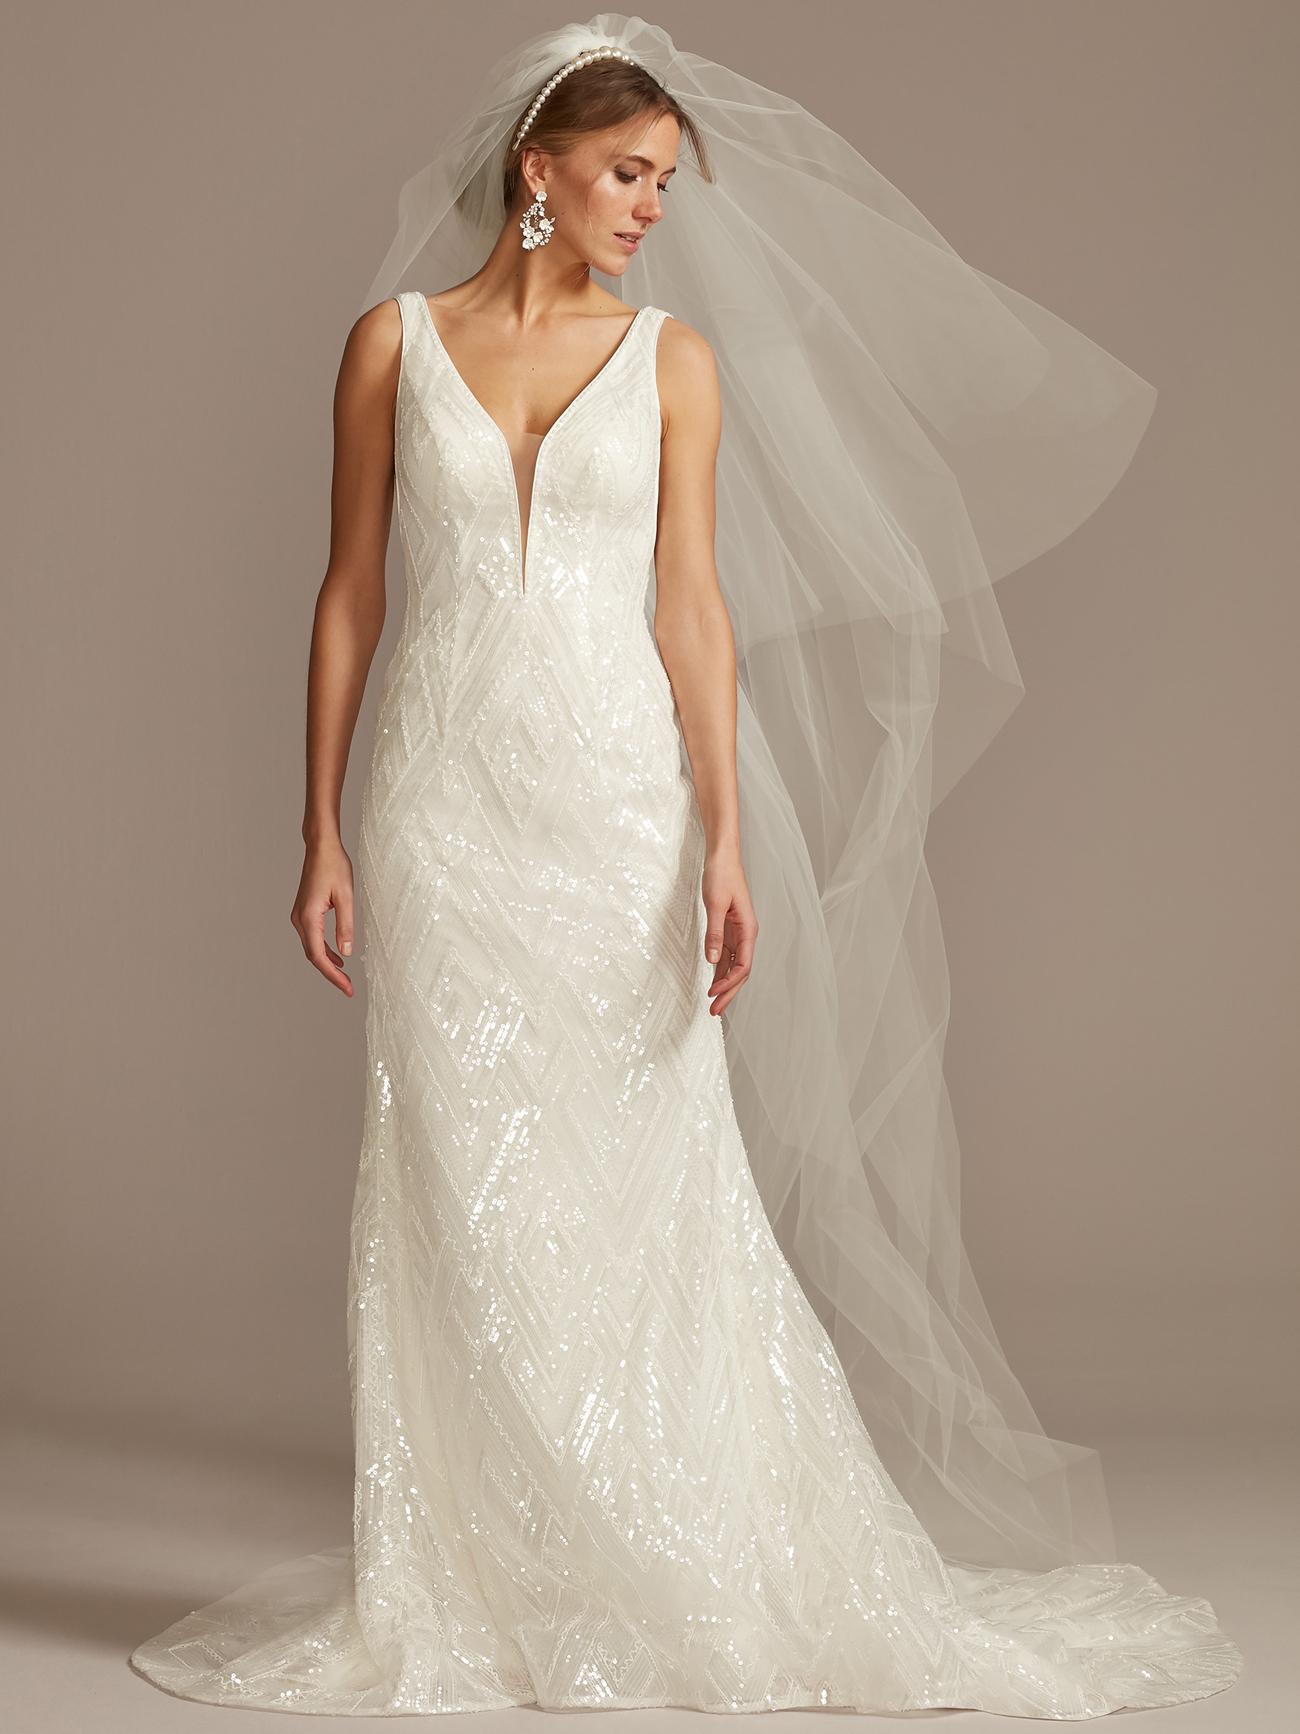 davids bridal glittery deep v-neck wedding dress spring 2021